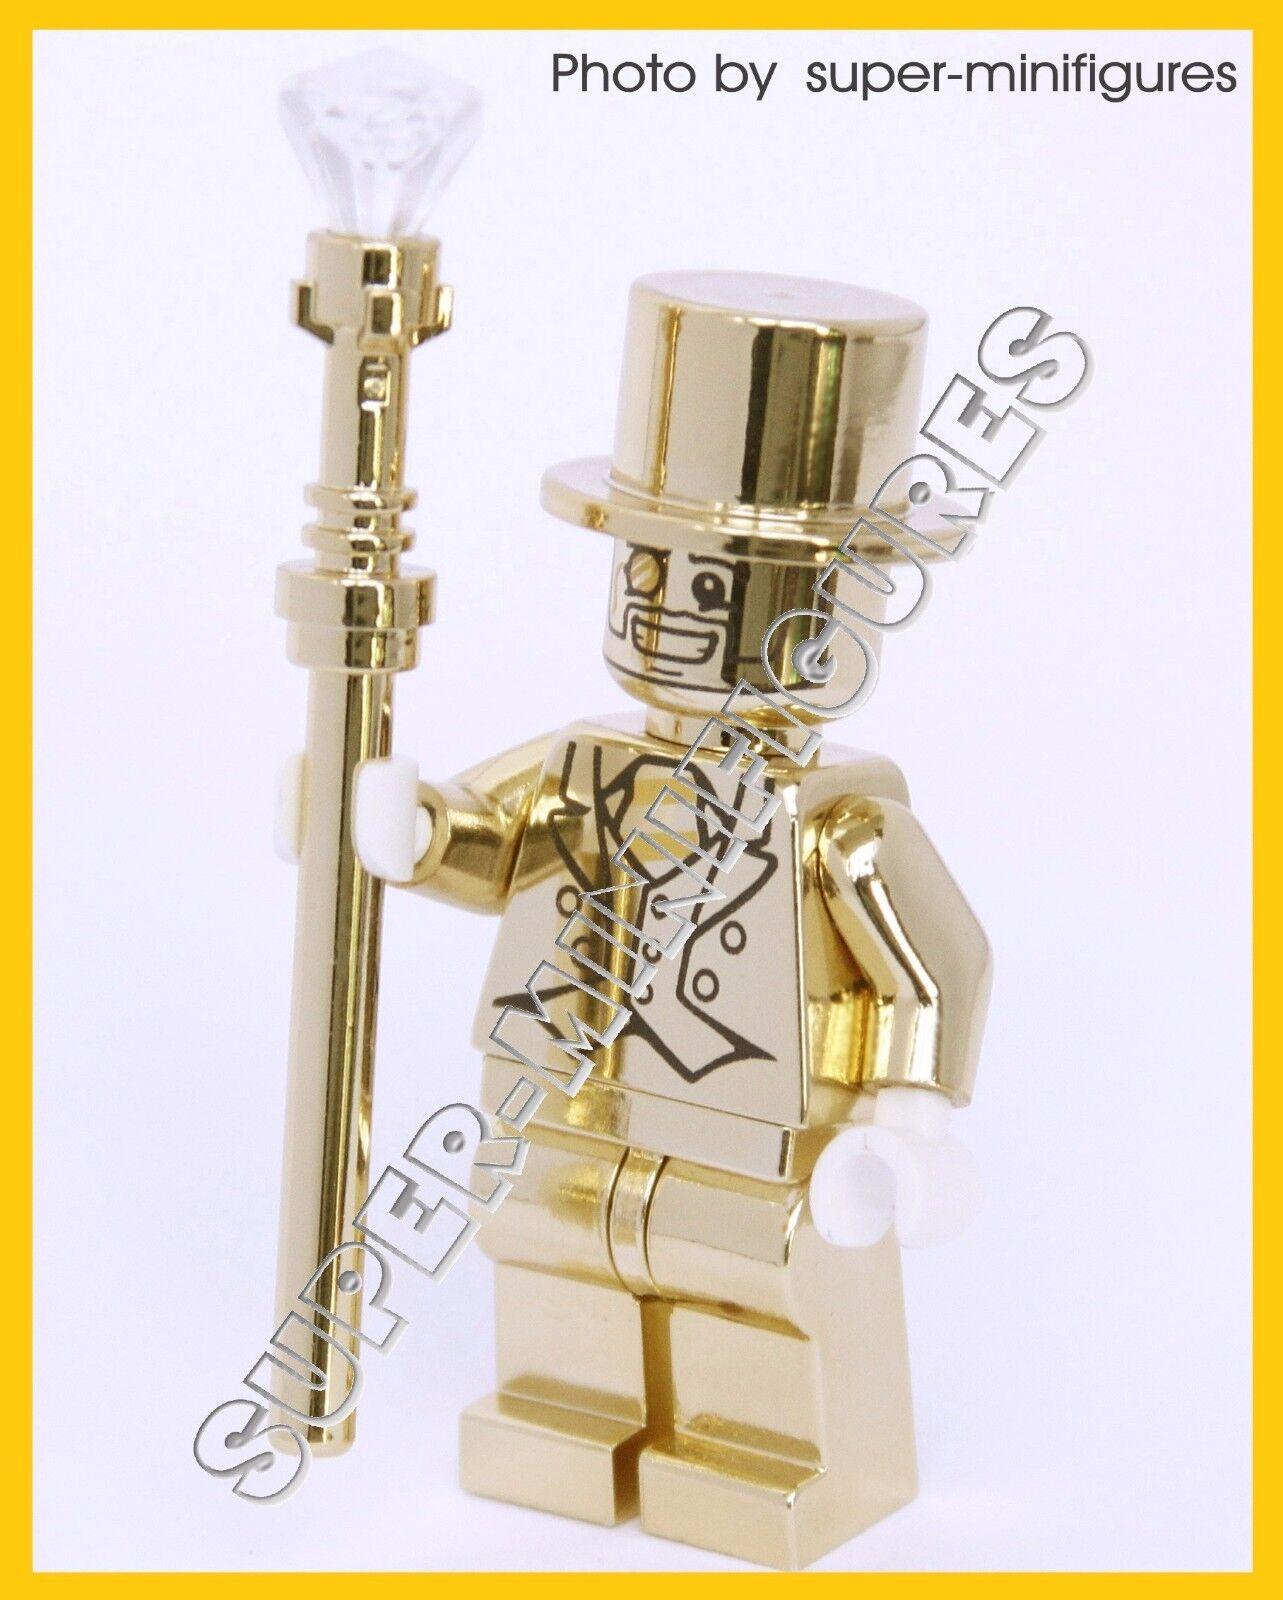 2x MR.oro Minifigures series 10   lego custom